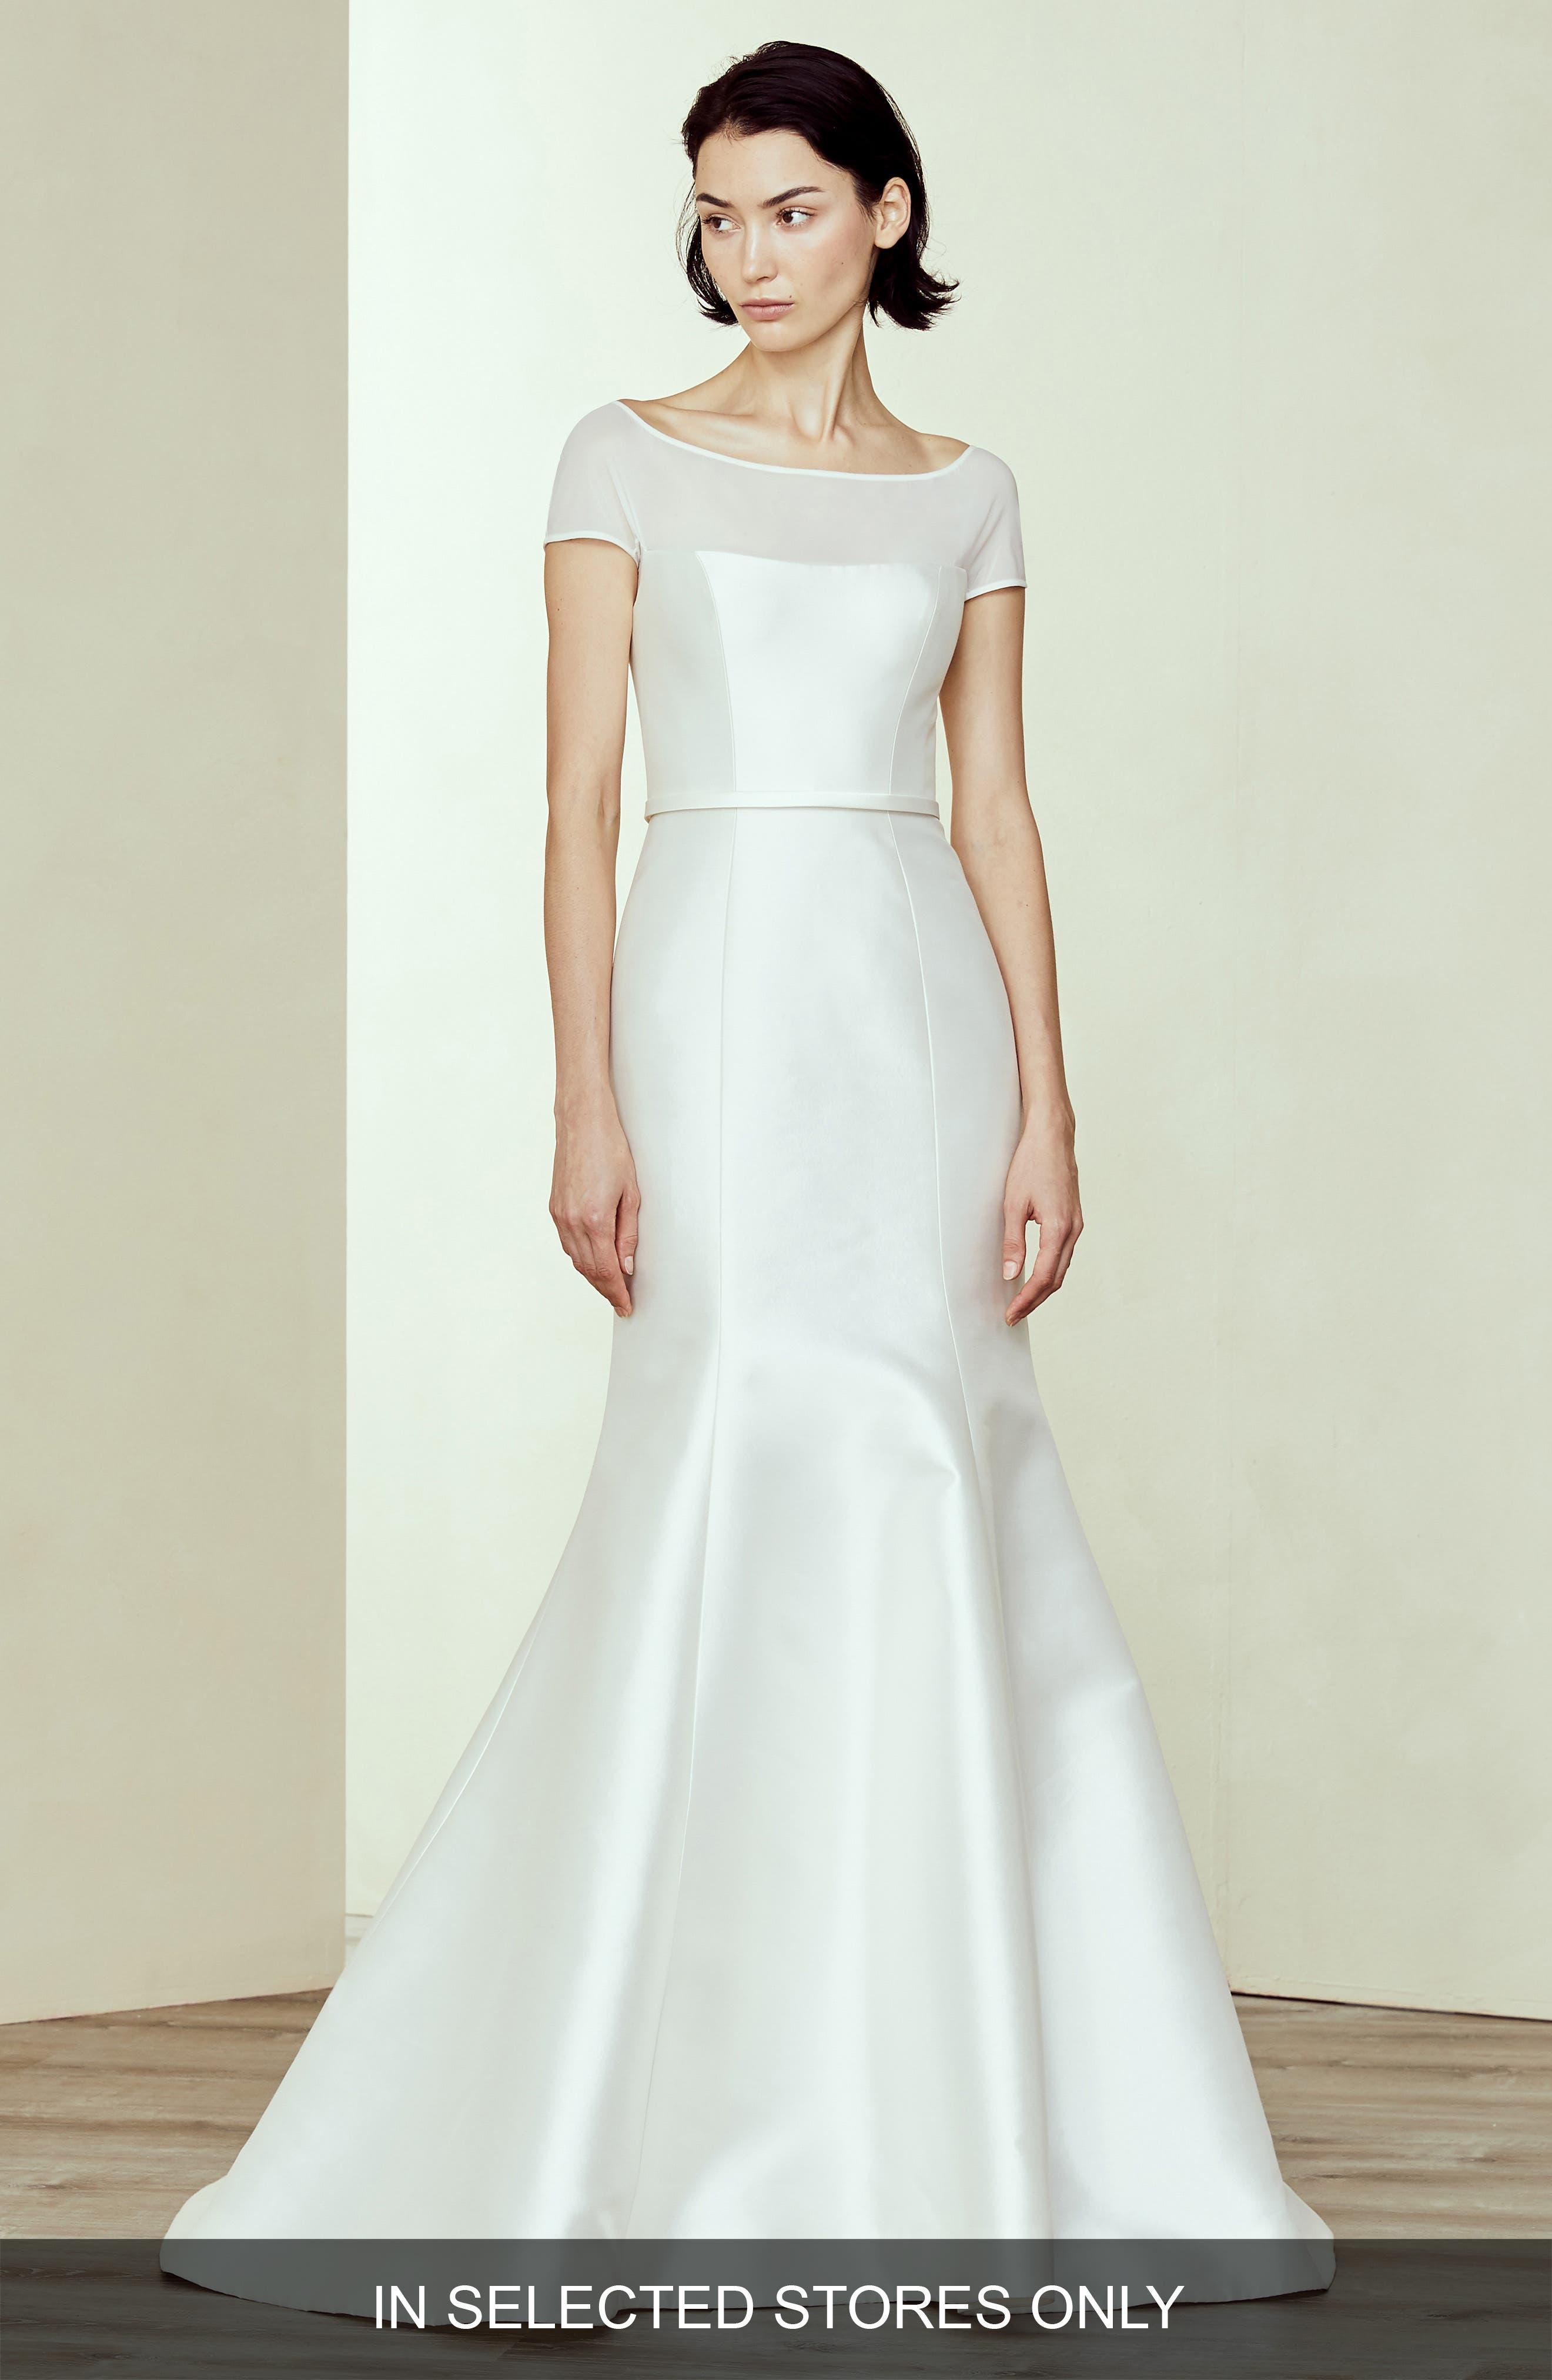 Amsale Denver Silk & Wool Off The Shoulder Weddding Dress, Size IN STORE ONLY - Ivory